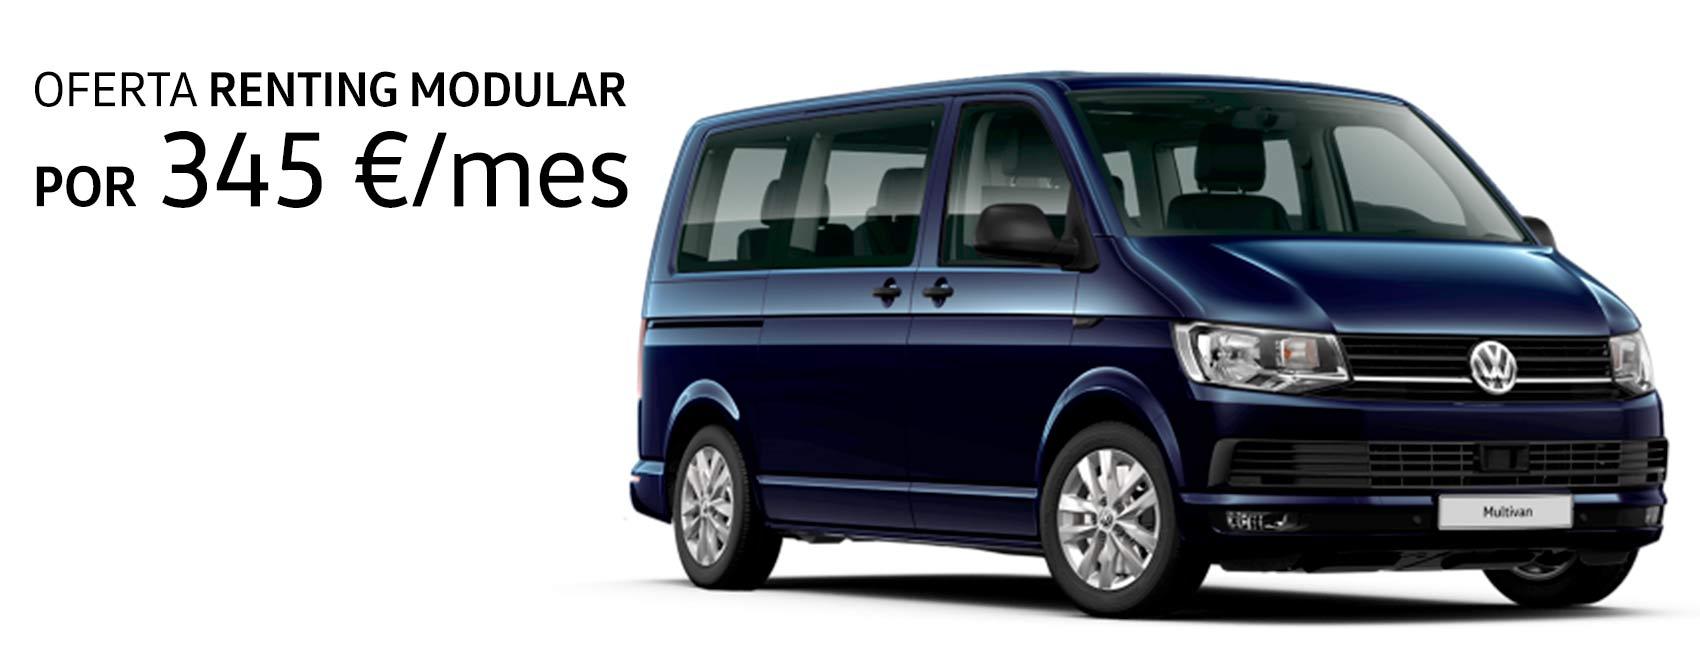 Oferta Multivan con renting modular en Sartopina